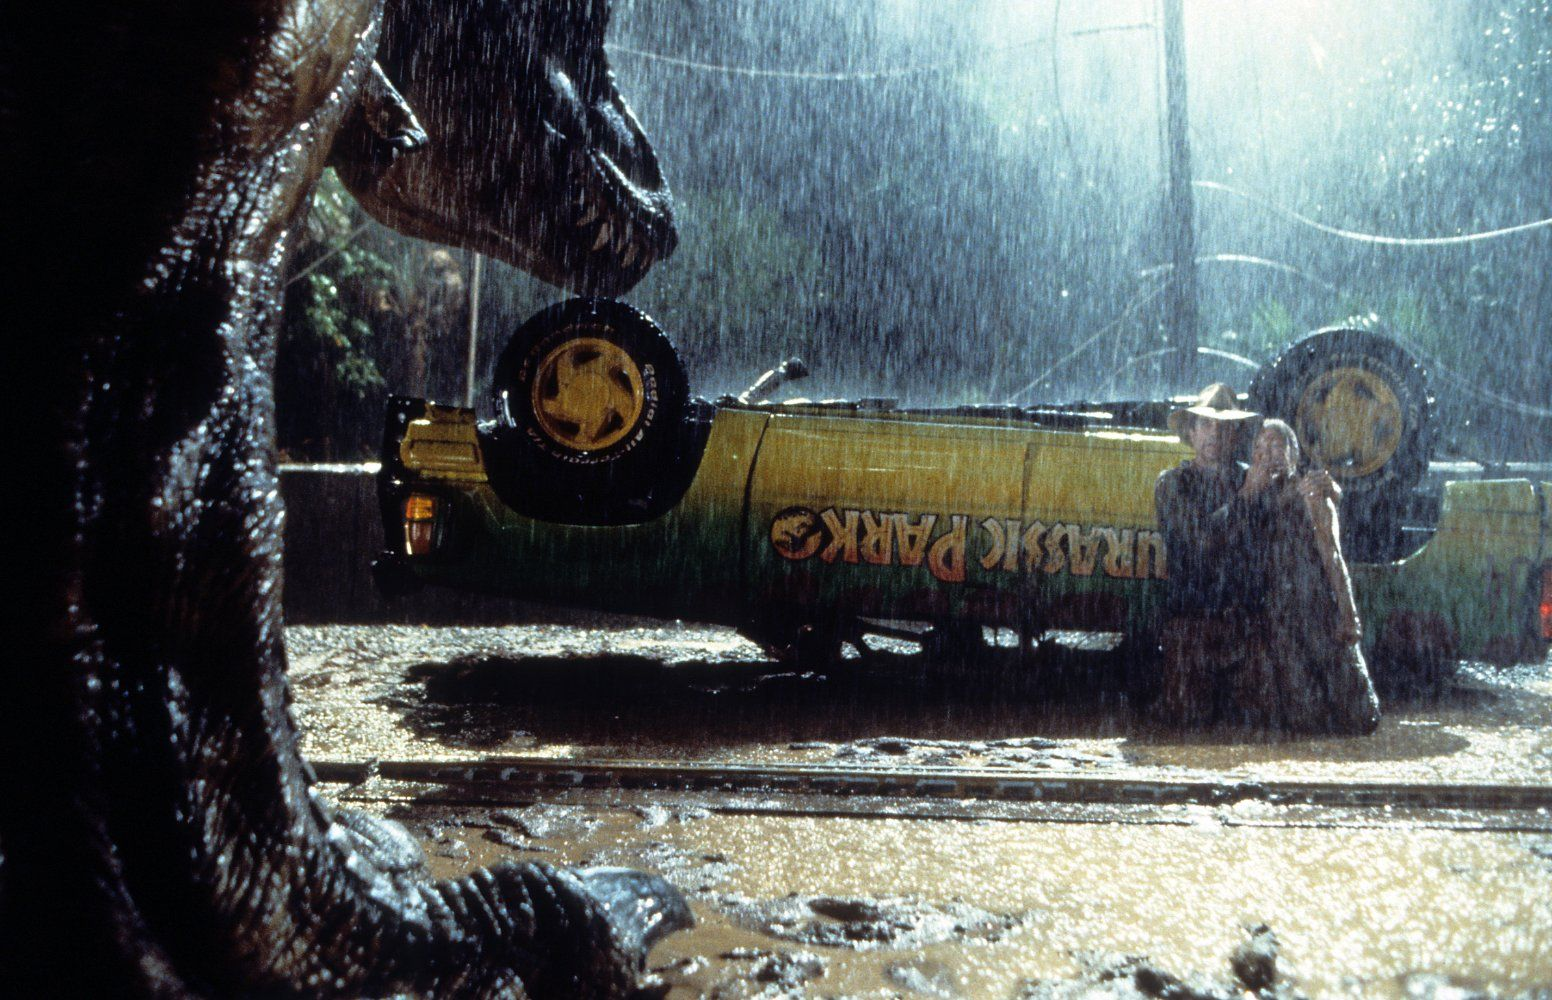 Jurassic Park Dvd Jurassic Park Dvd Jurassic Park 1993 Jurassic Park Movie Jurassic Park